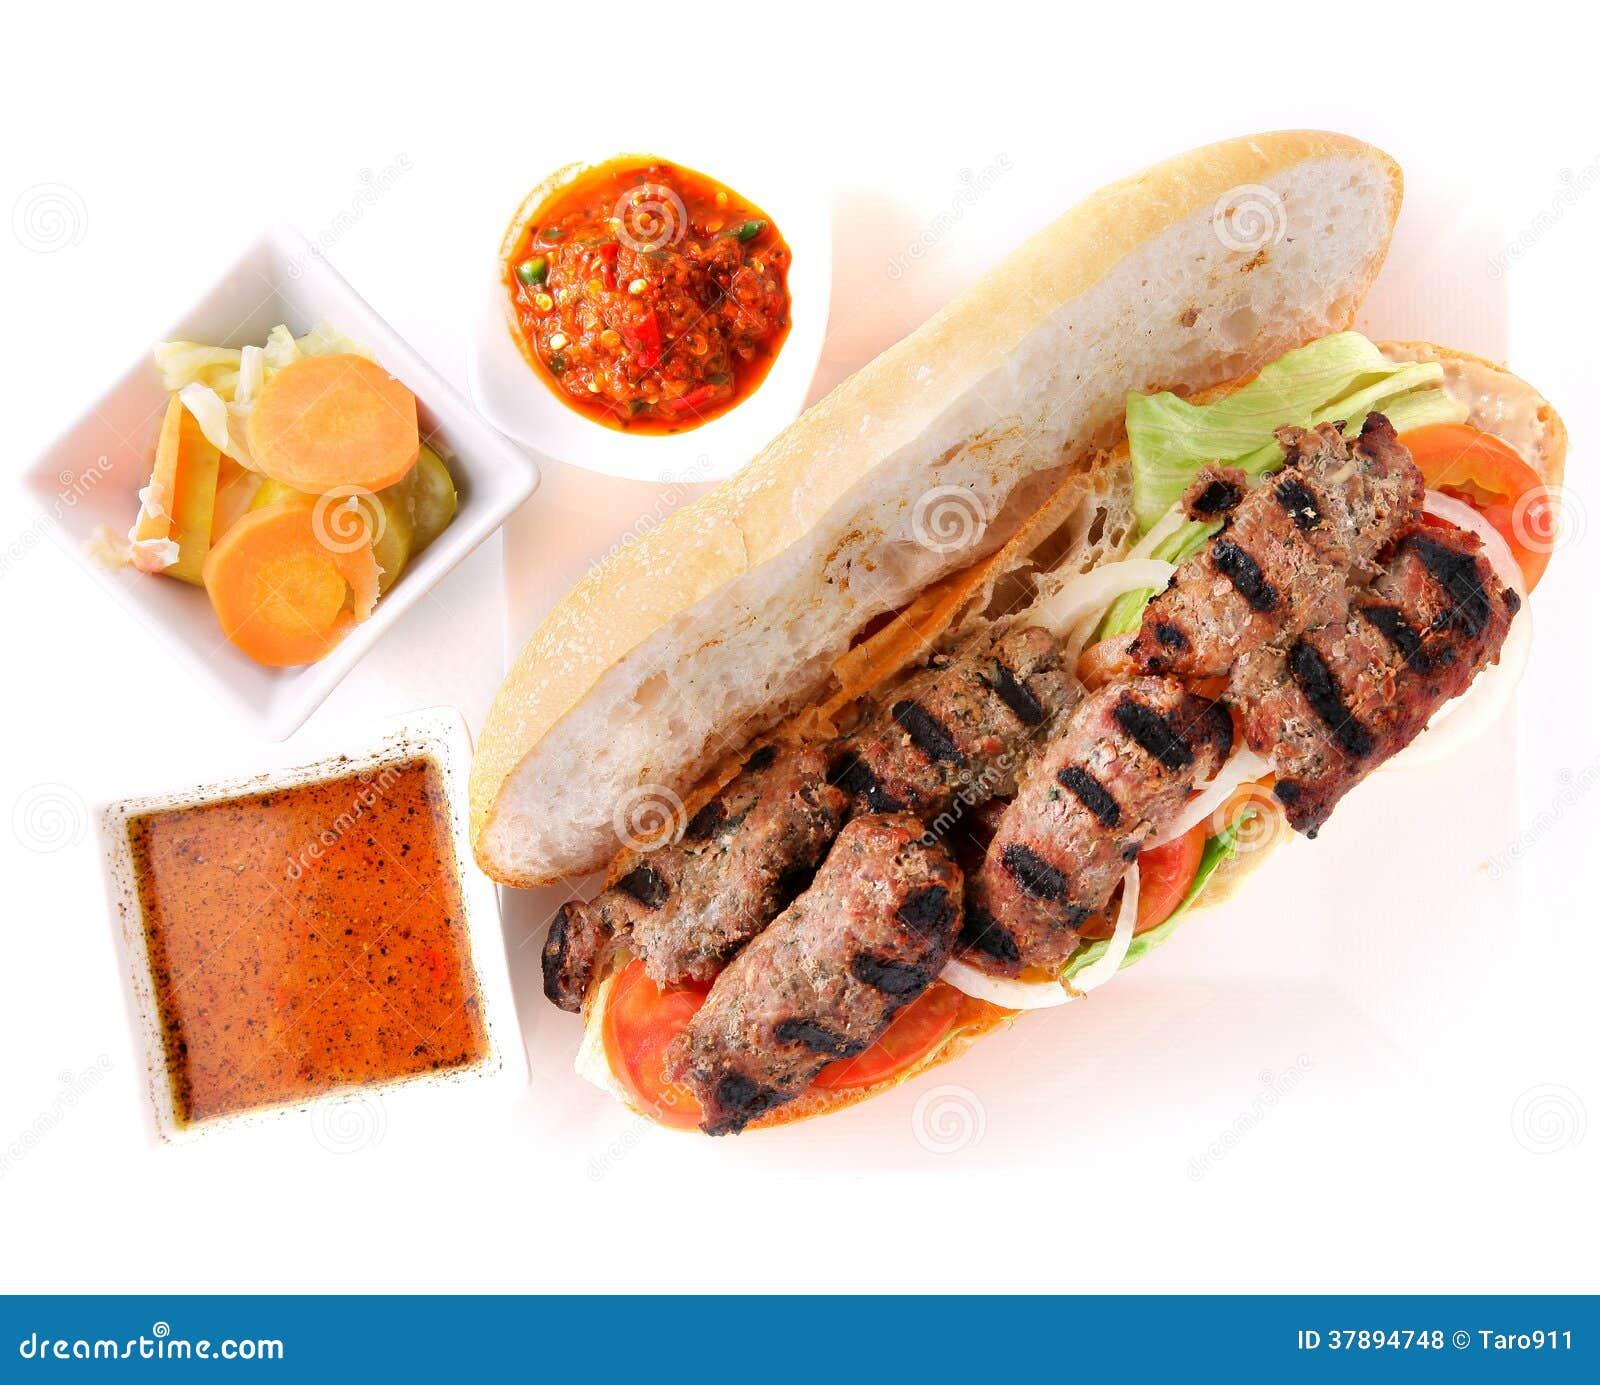 Geroosterde rundvleessandwich